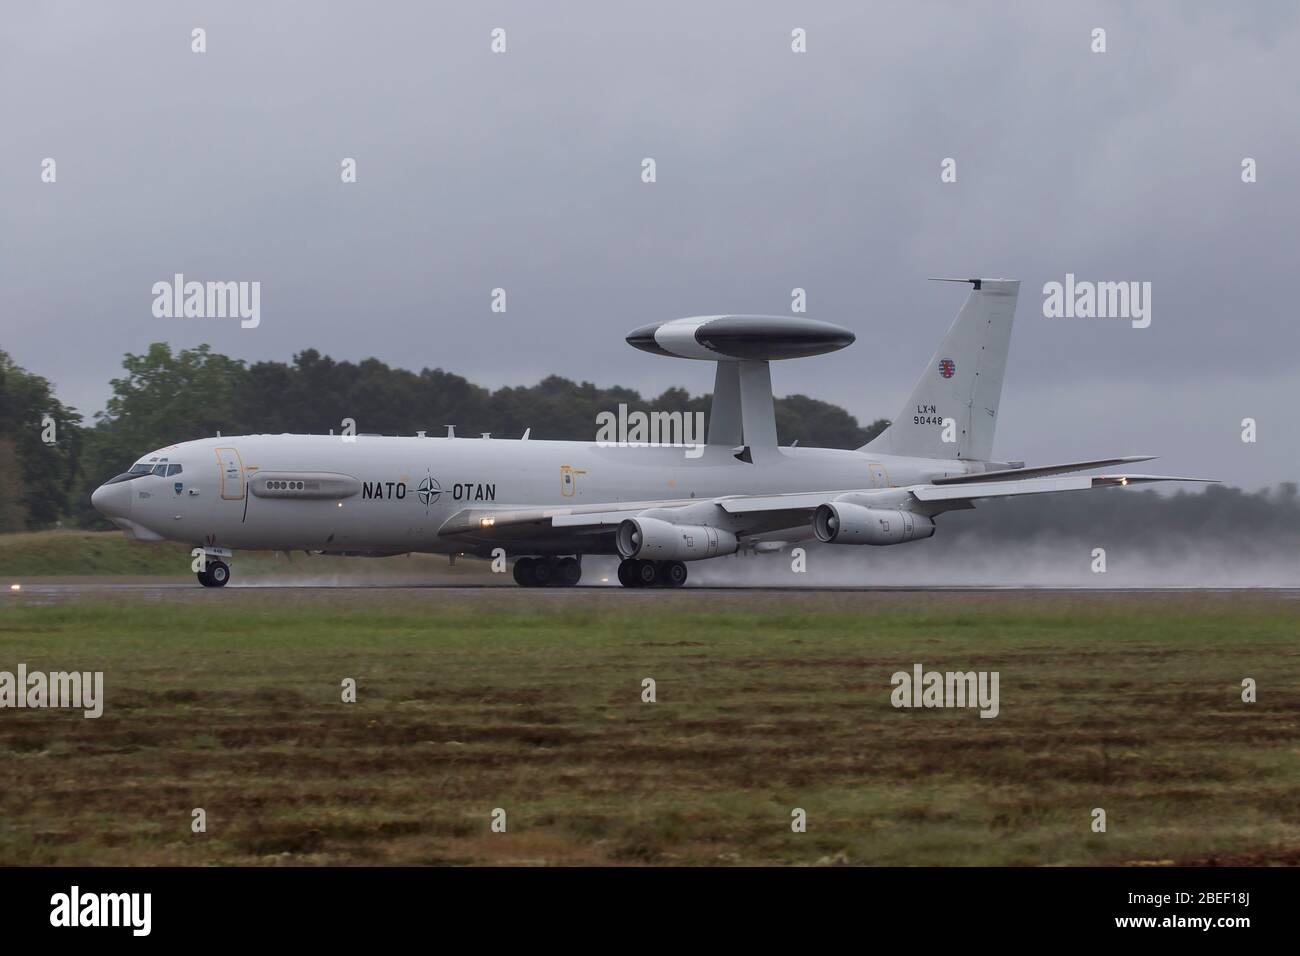 NATO Boeing E-3A Sentry at NATO Tiger Meet 2019 at French Air Force Mont de Marsan BA118 base Stock Photo